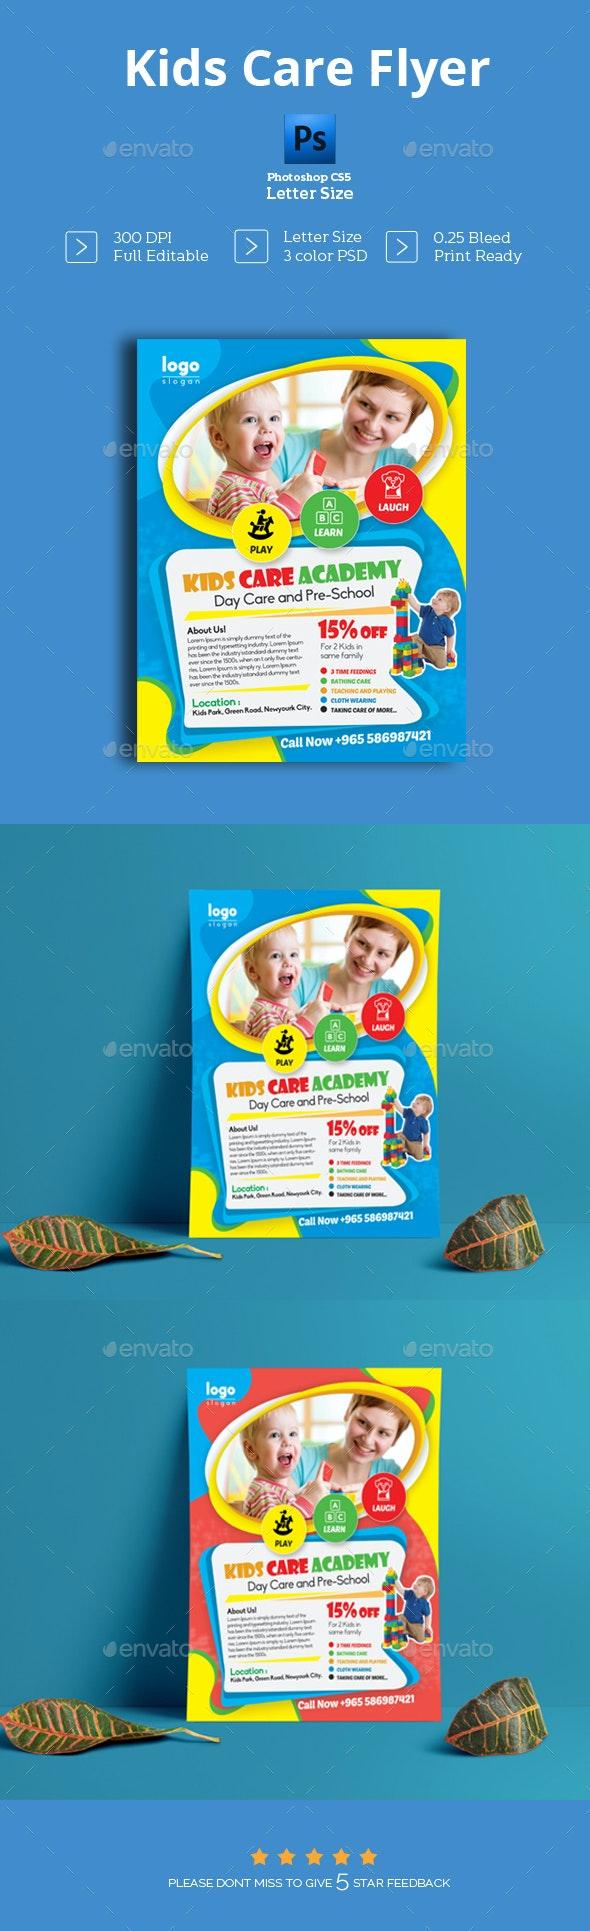 Kids Care Flyer - Flyers Print Templates